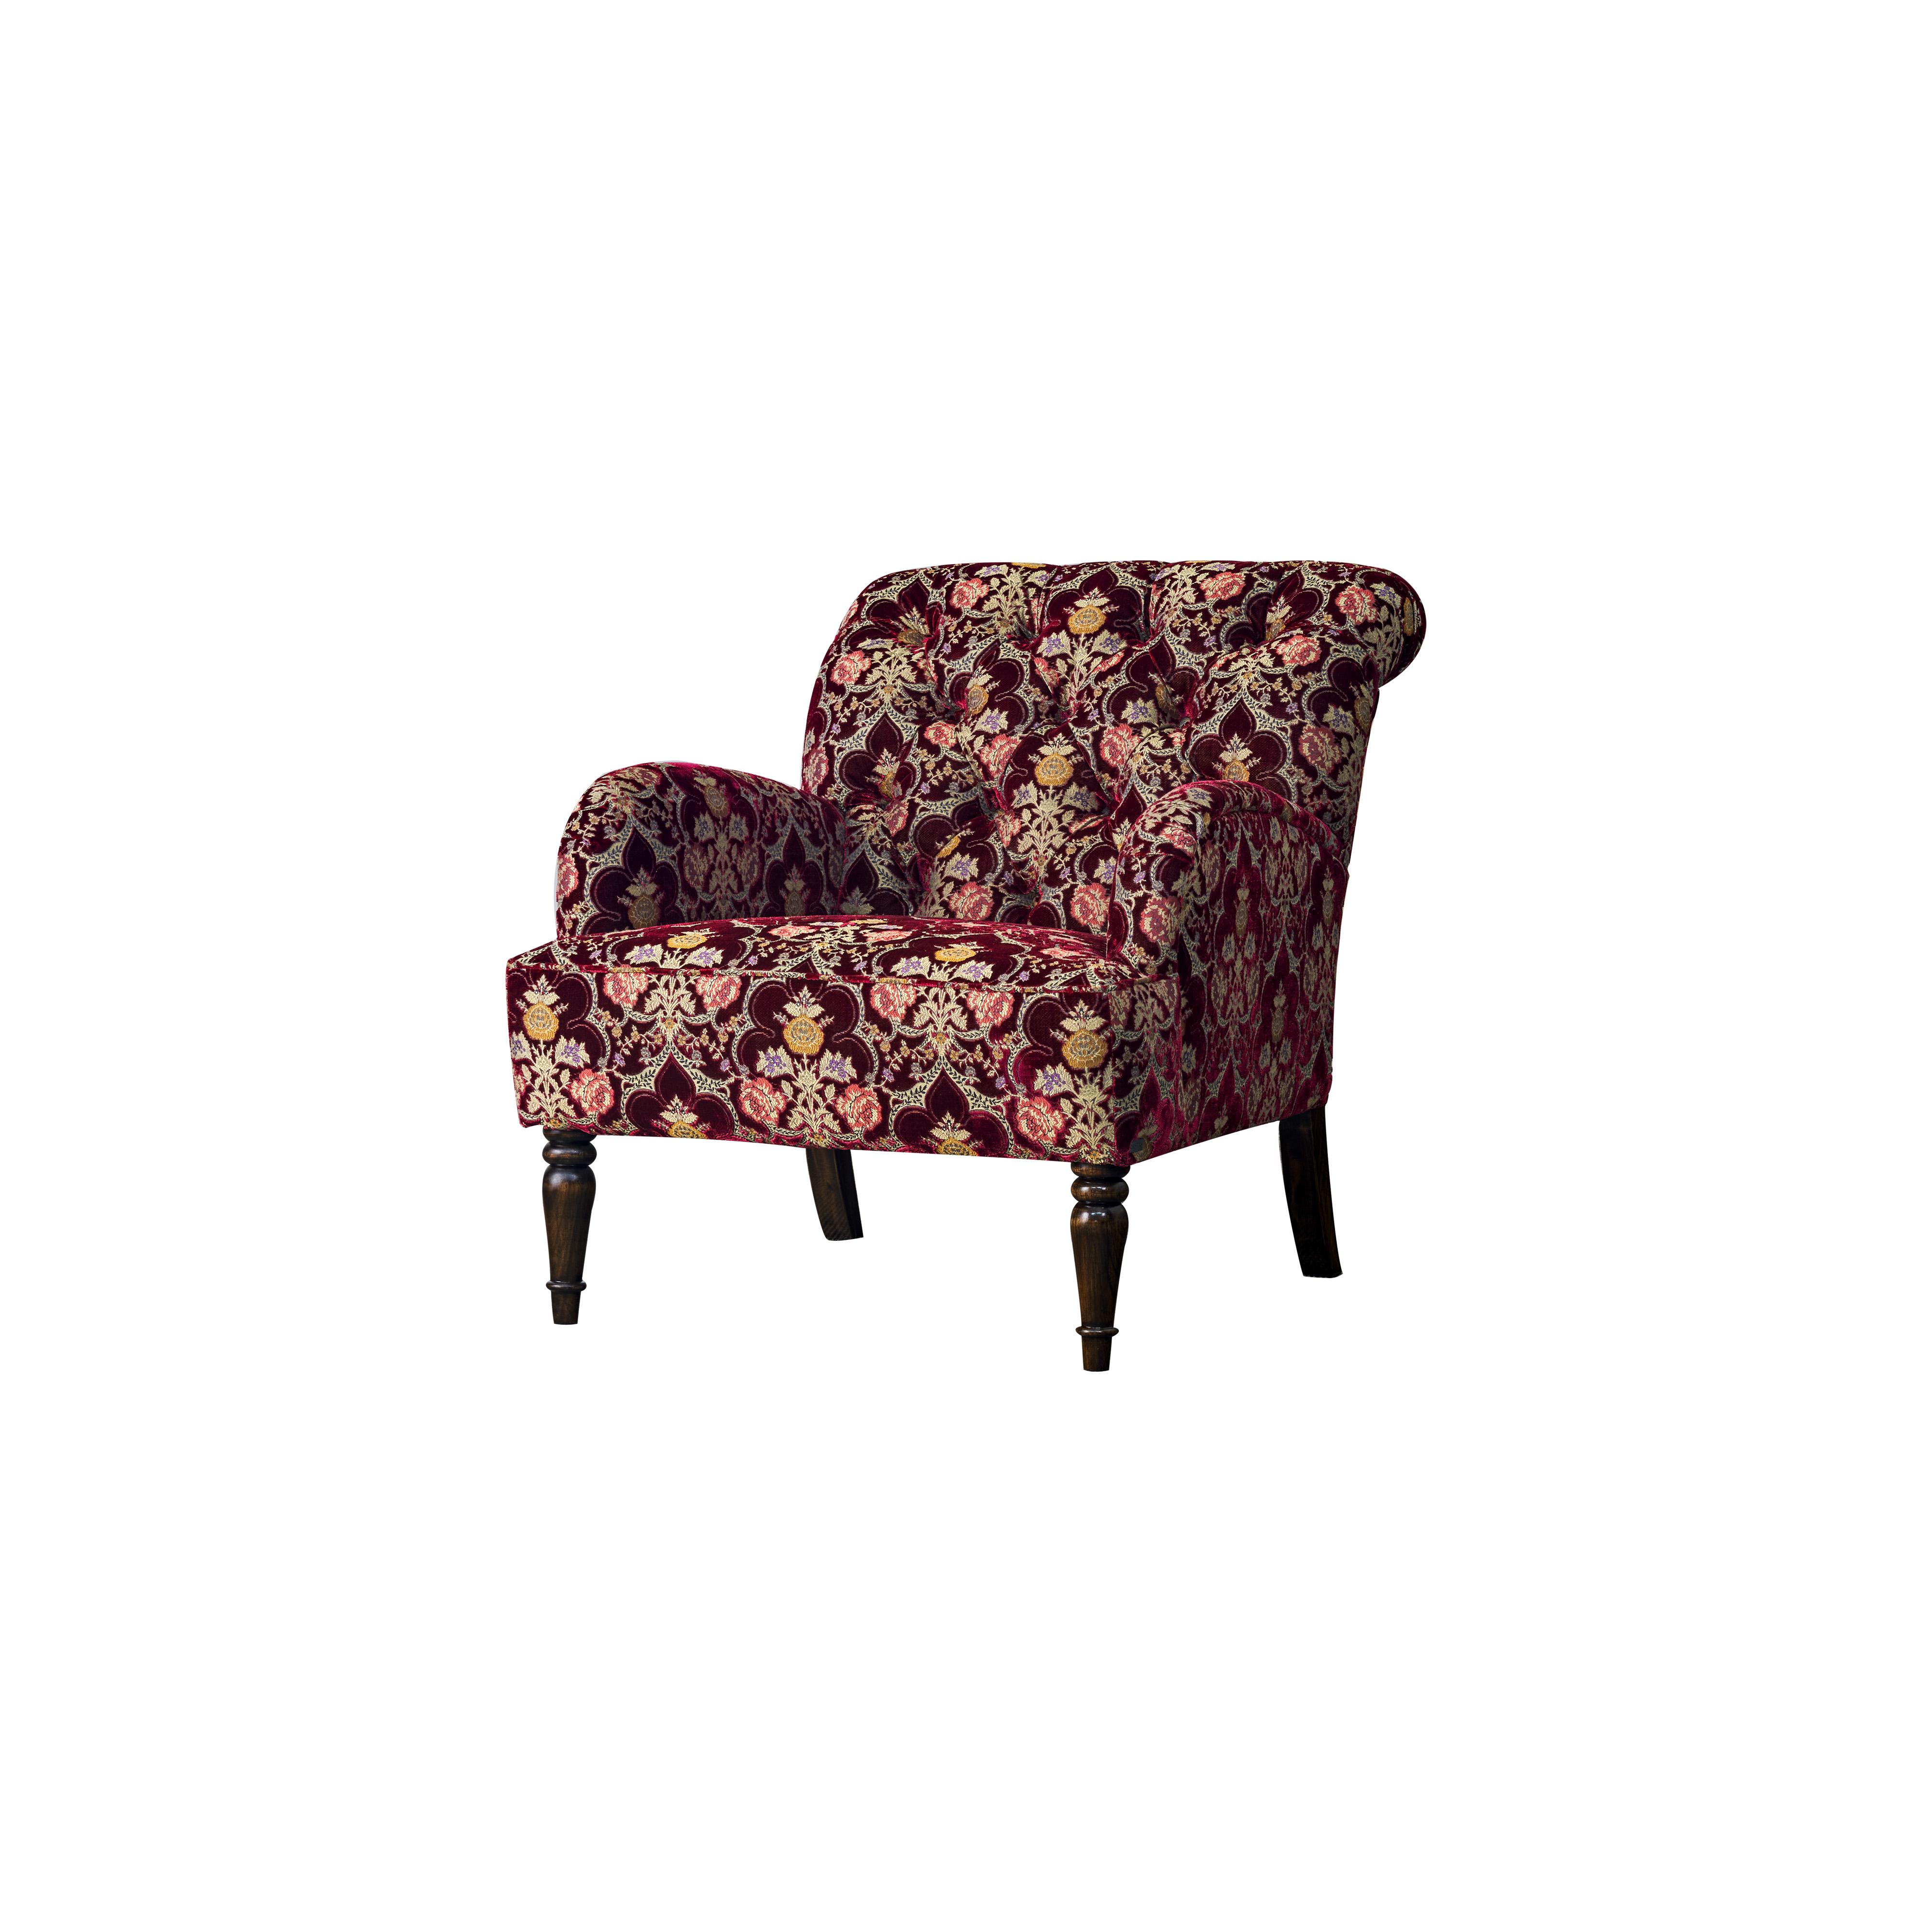 Bronte armchair